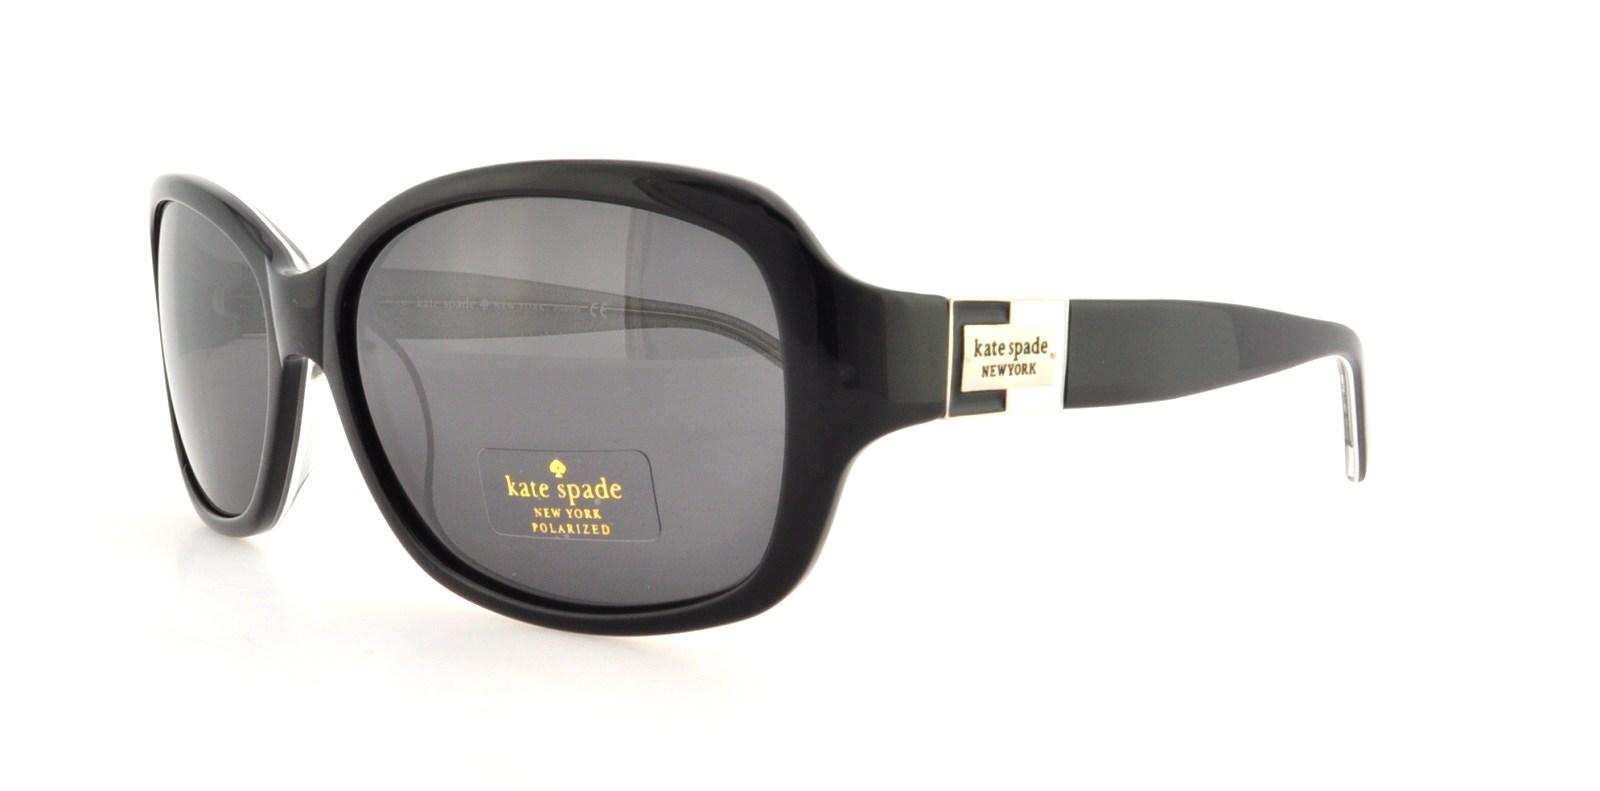 b7e2f484d3 KATE SPADE Sunglasses ANNIKA S JBHP Black Silver Sparkle 56MM